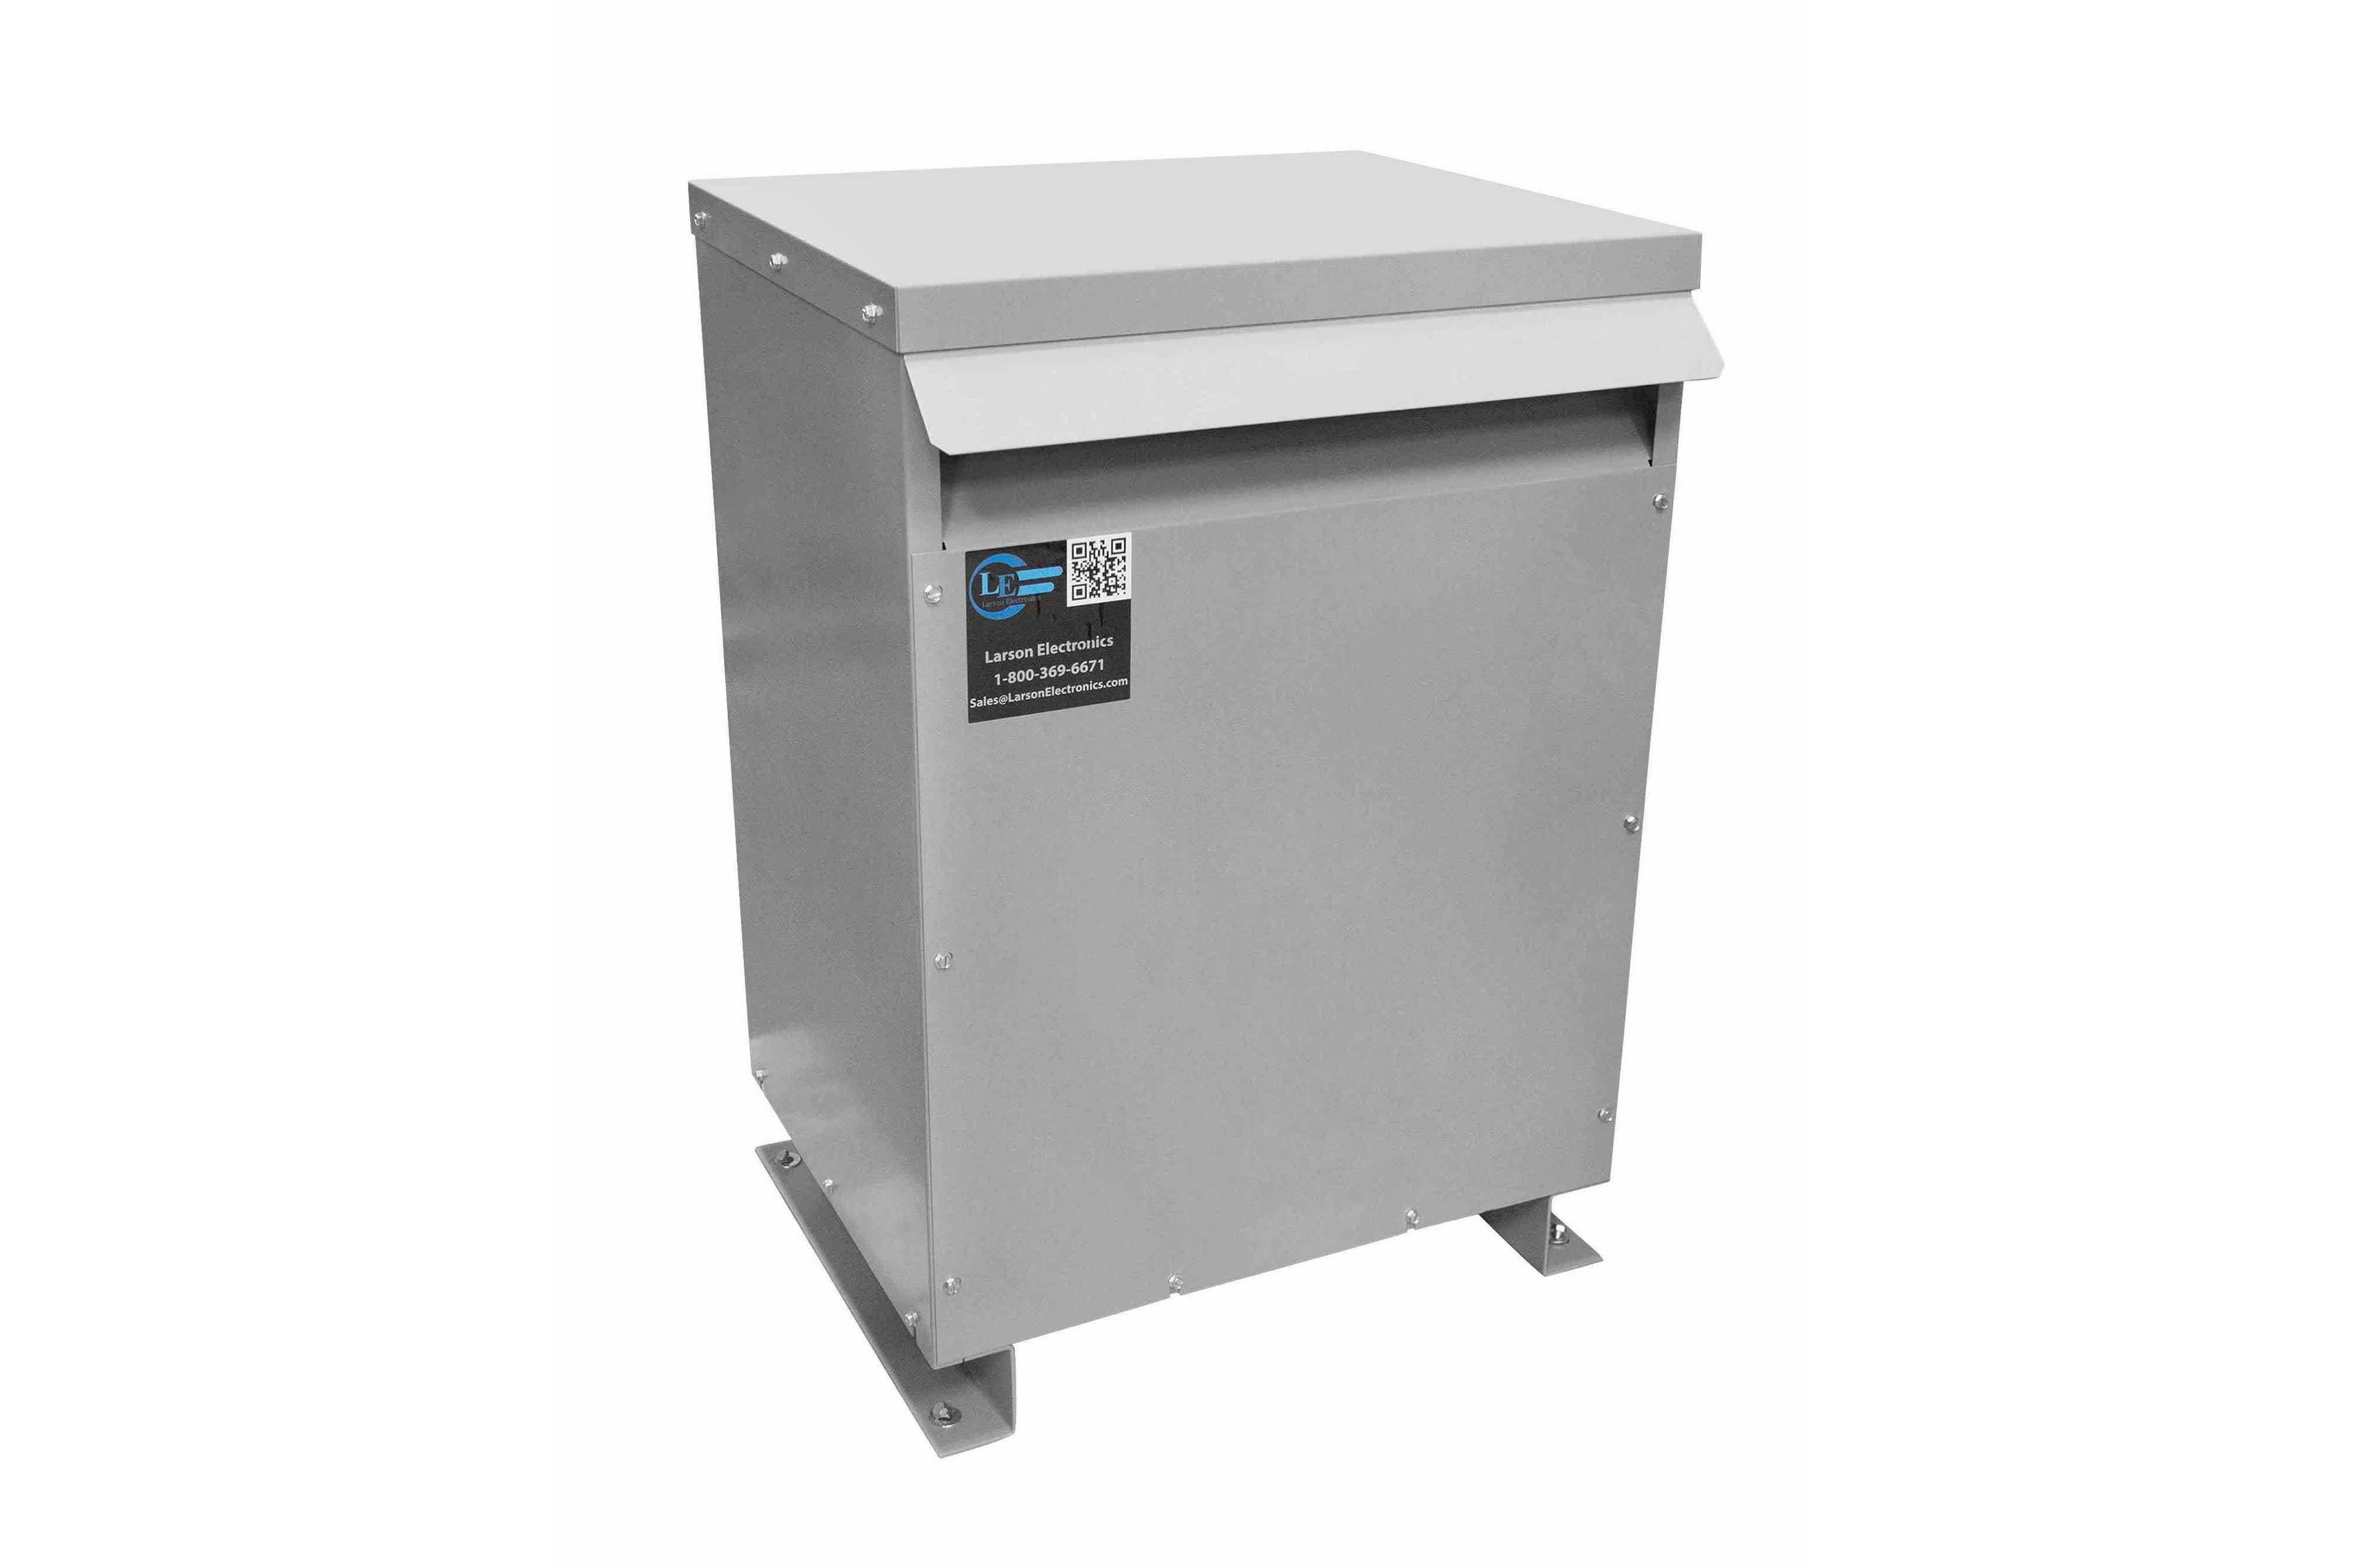 225 kVA 3PH DOE Transformer, 415V Delta Primary, 600Y/347 Wye-N Secondary, N3R, Ventilated, 60 Hz